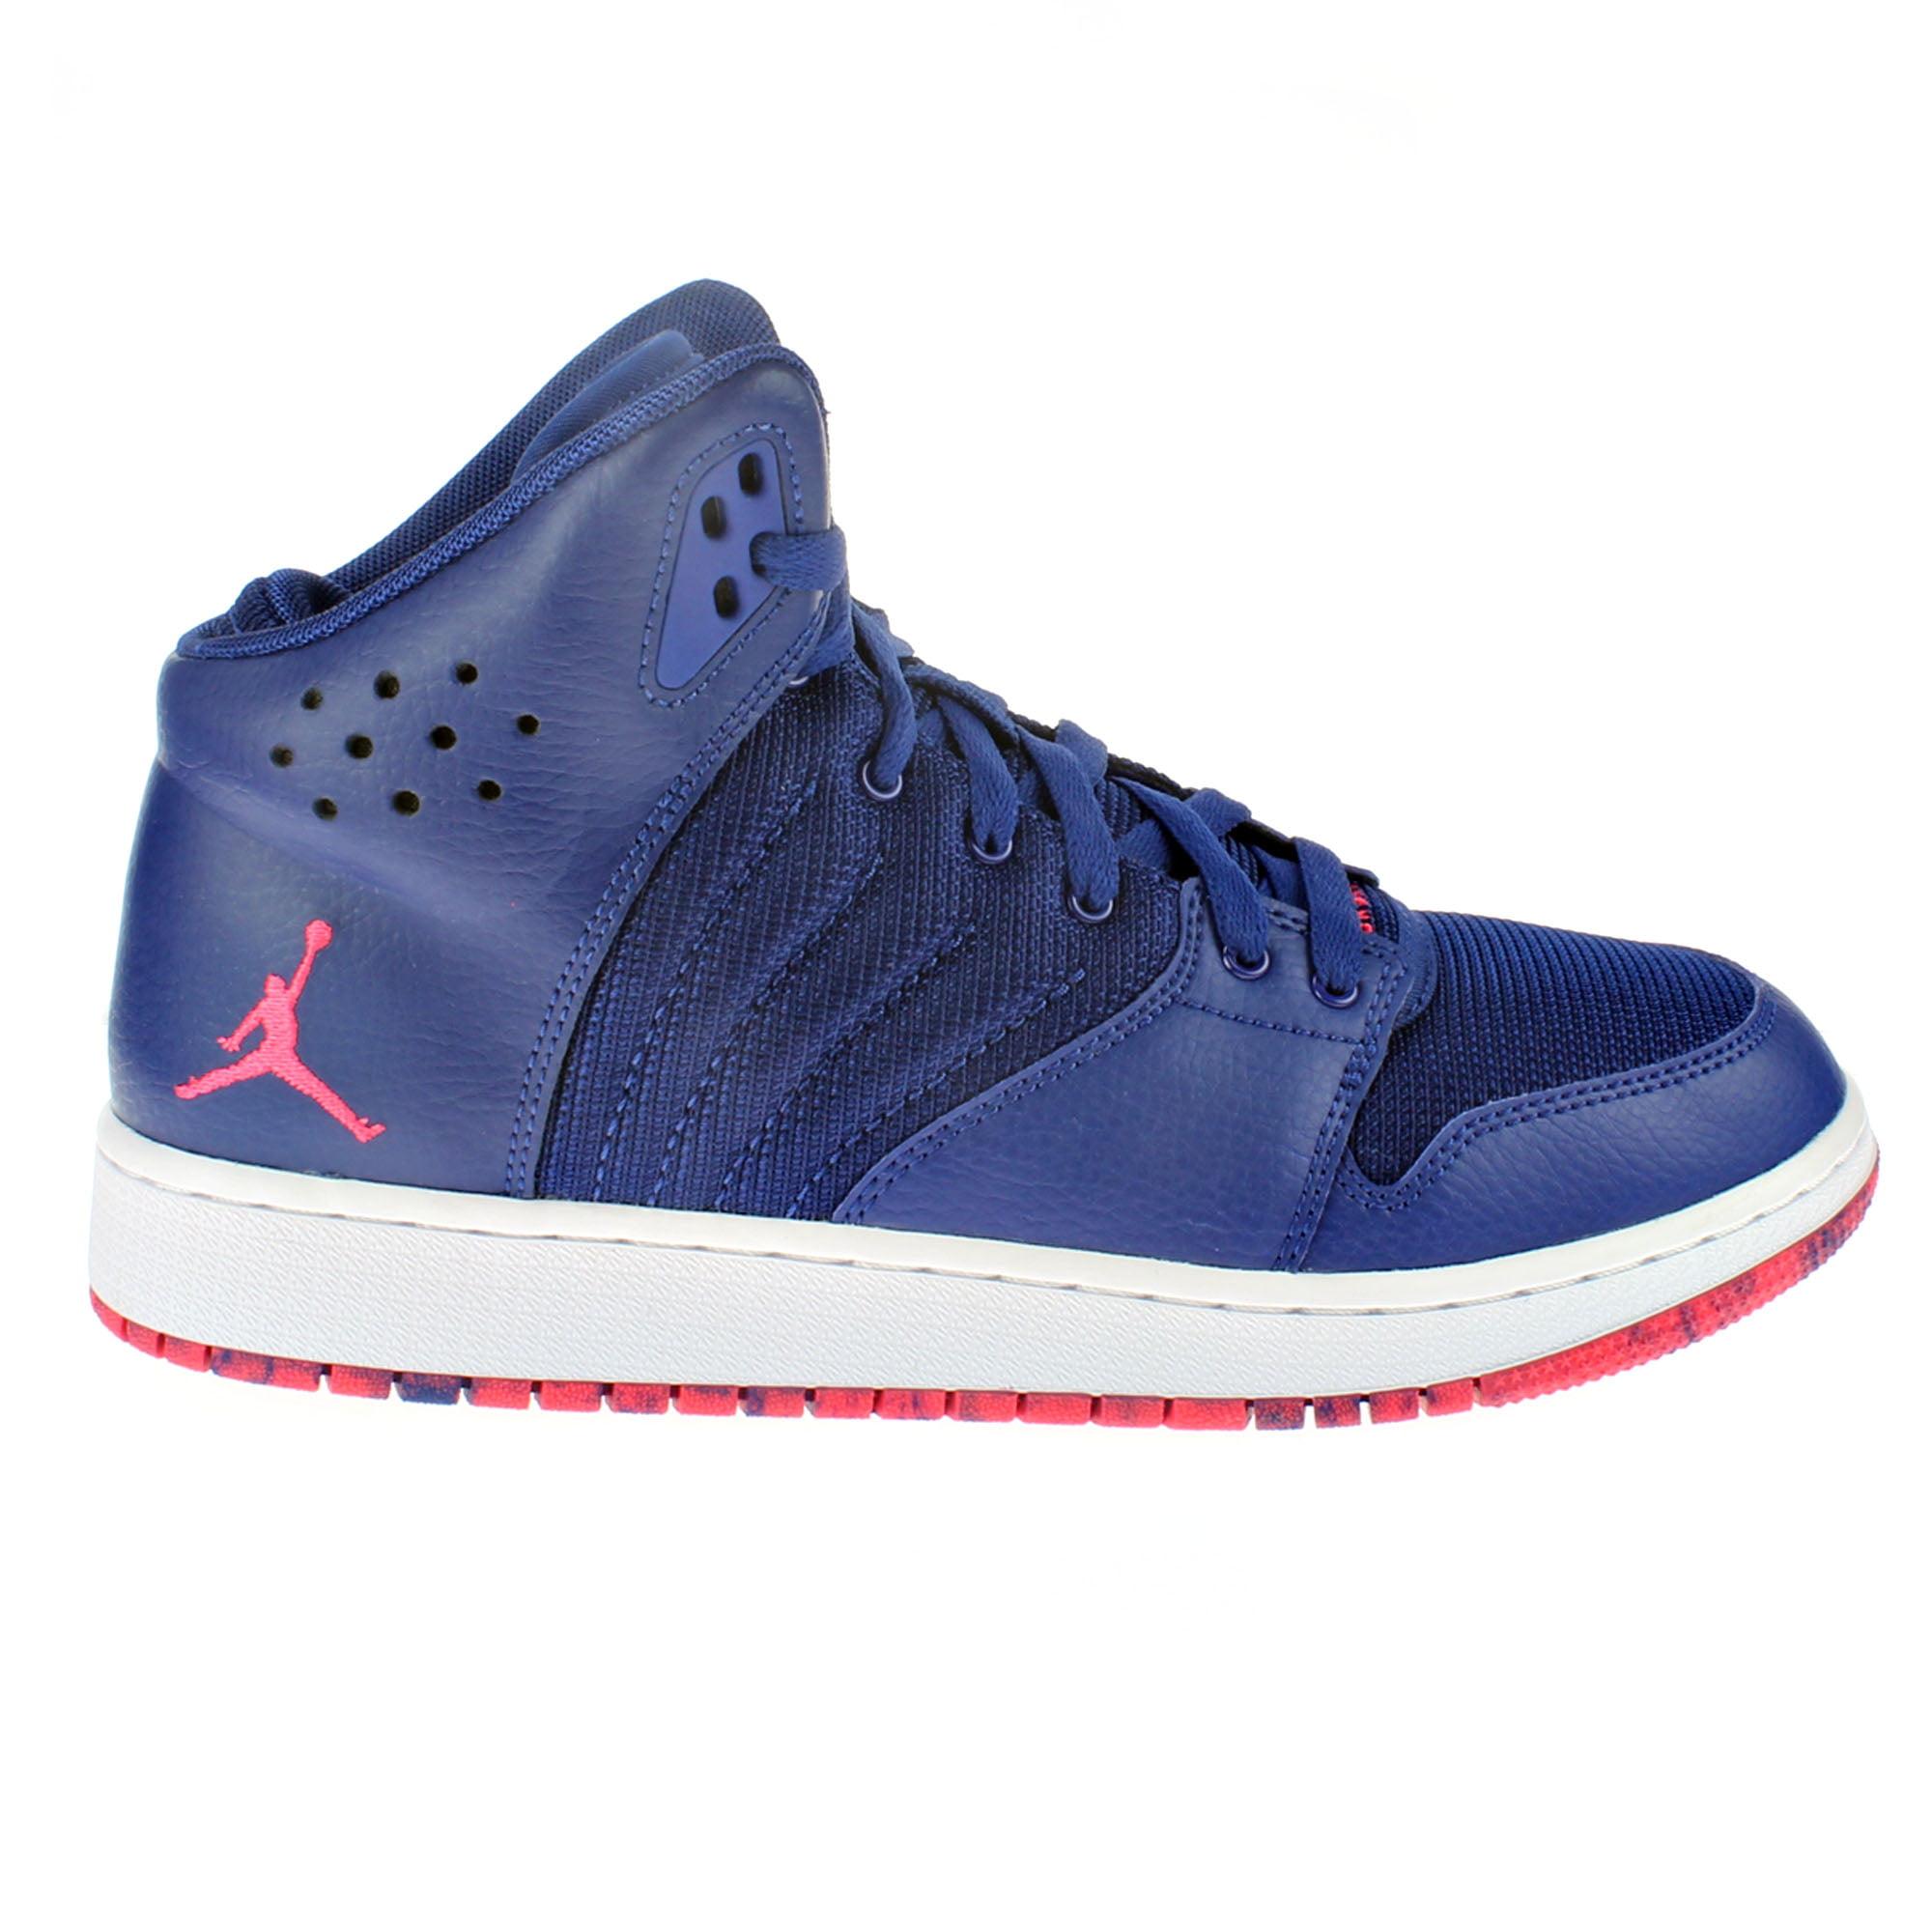 Nike Kids Jordan 1 Flight 4 Prem BG